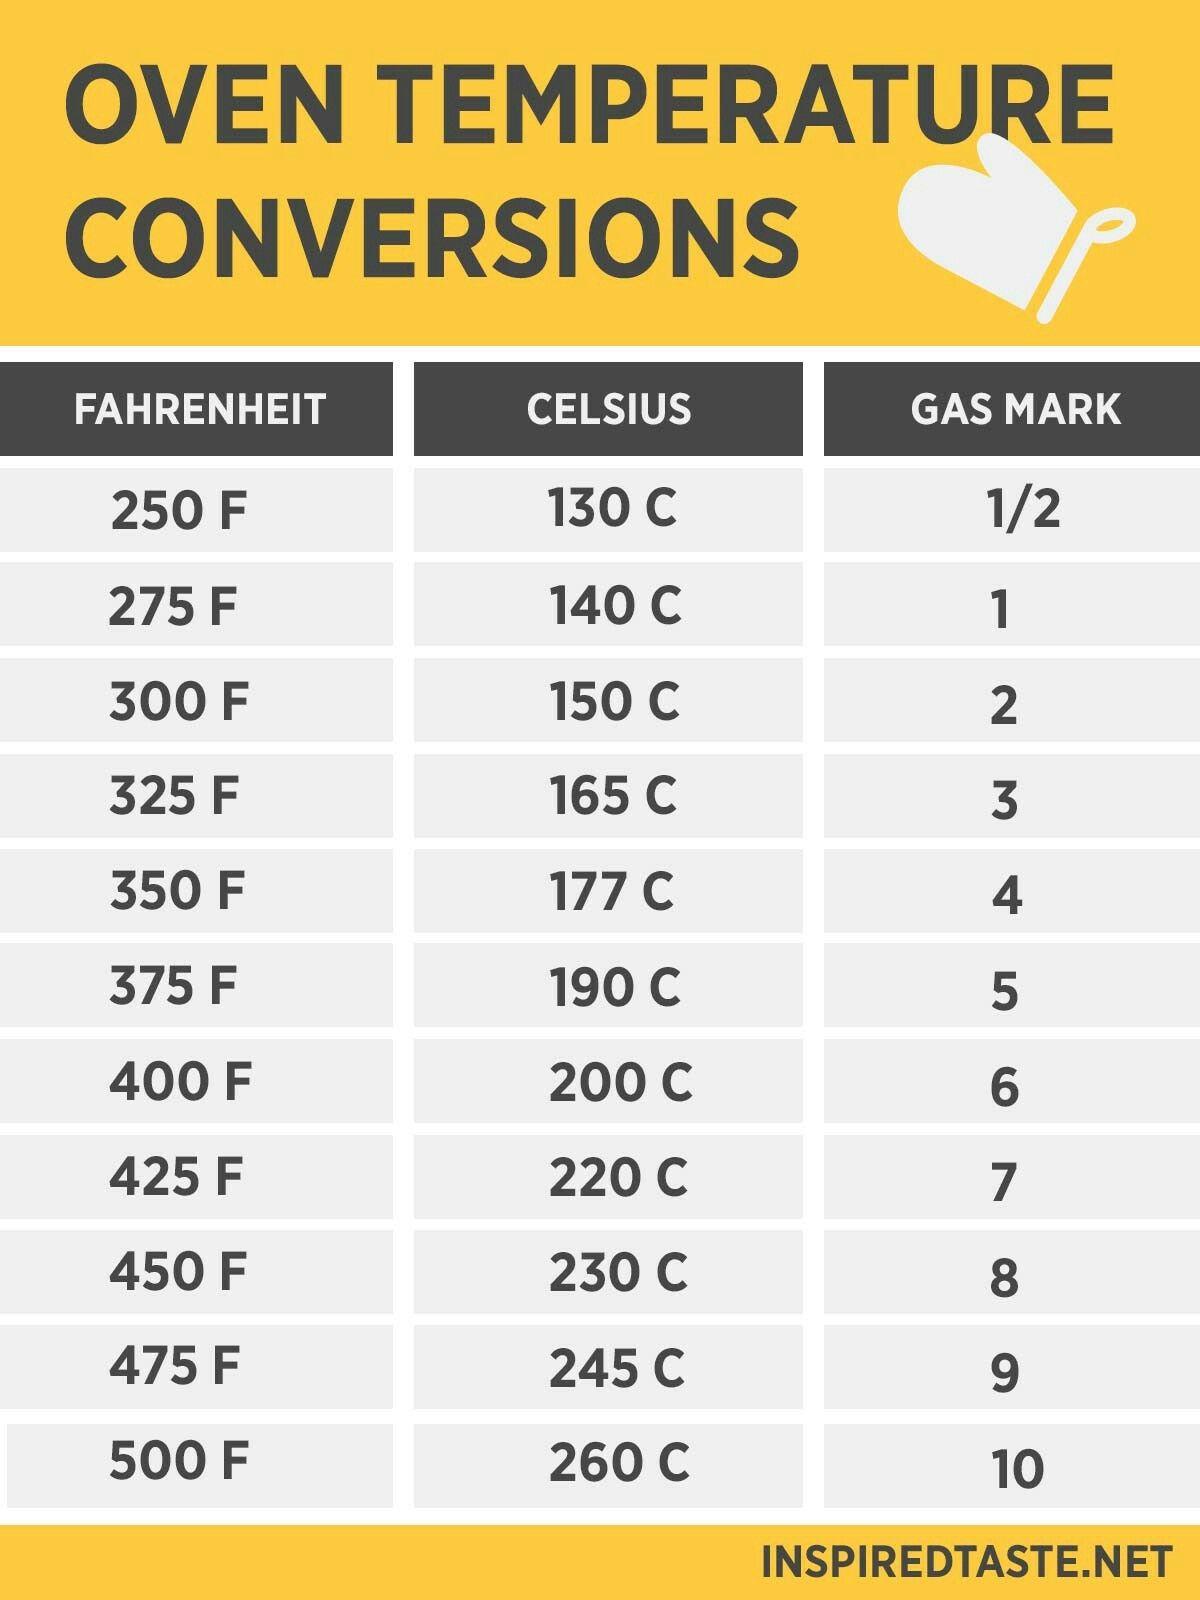 Oven temperature conversion chart fahrenheit to celsius gas mark also rh pinterest